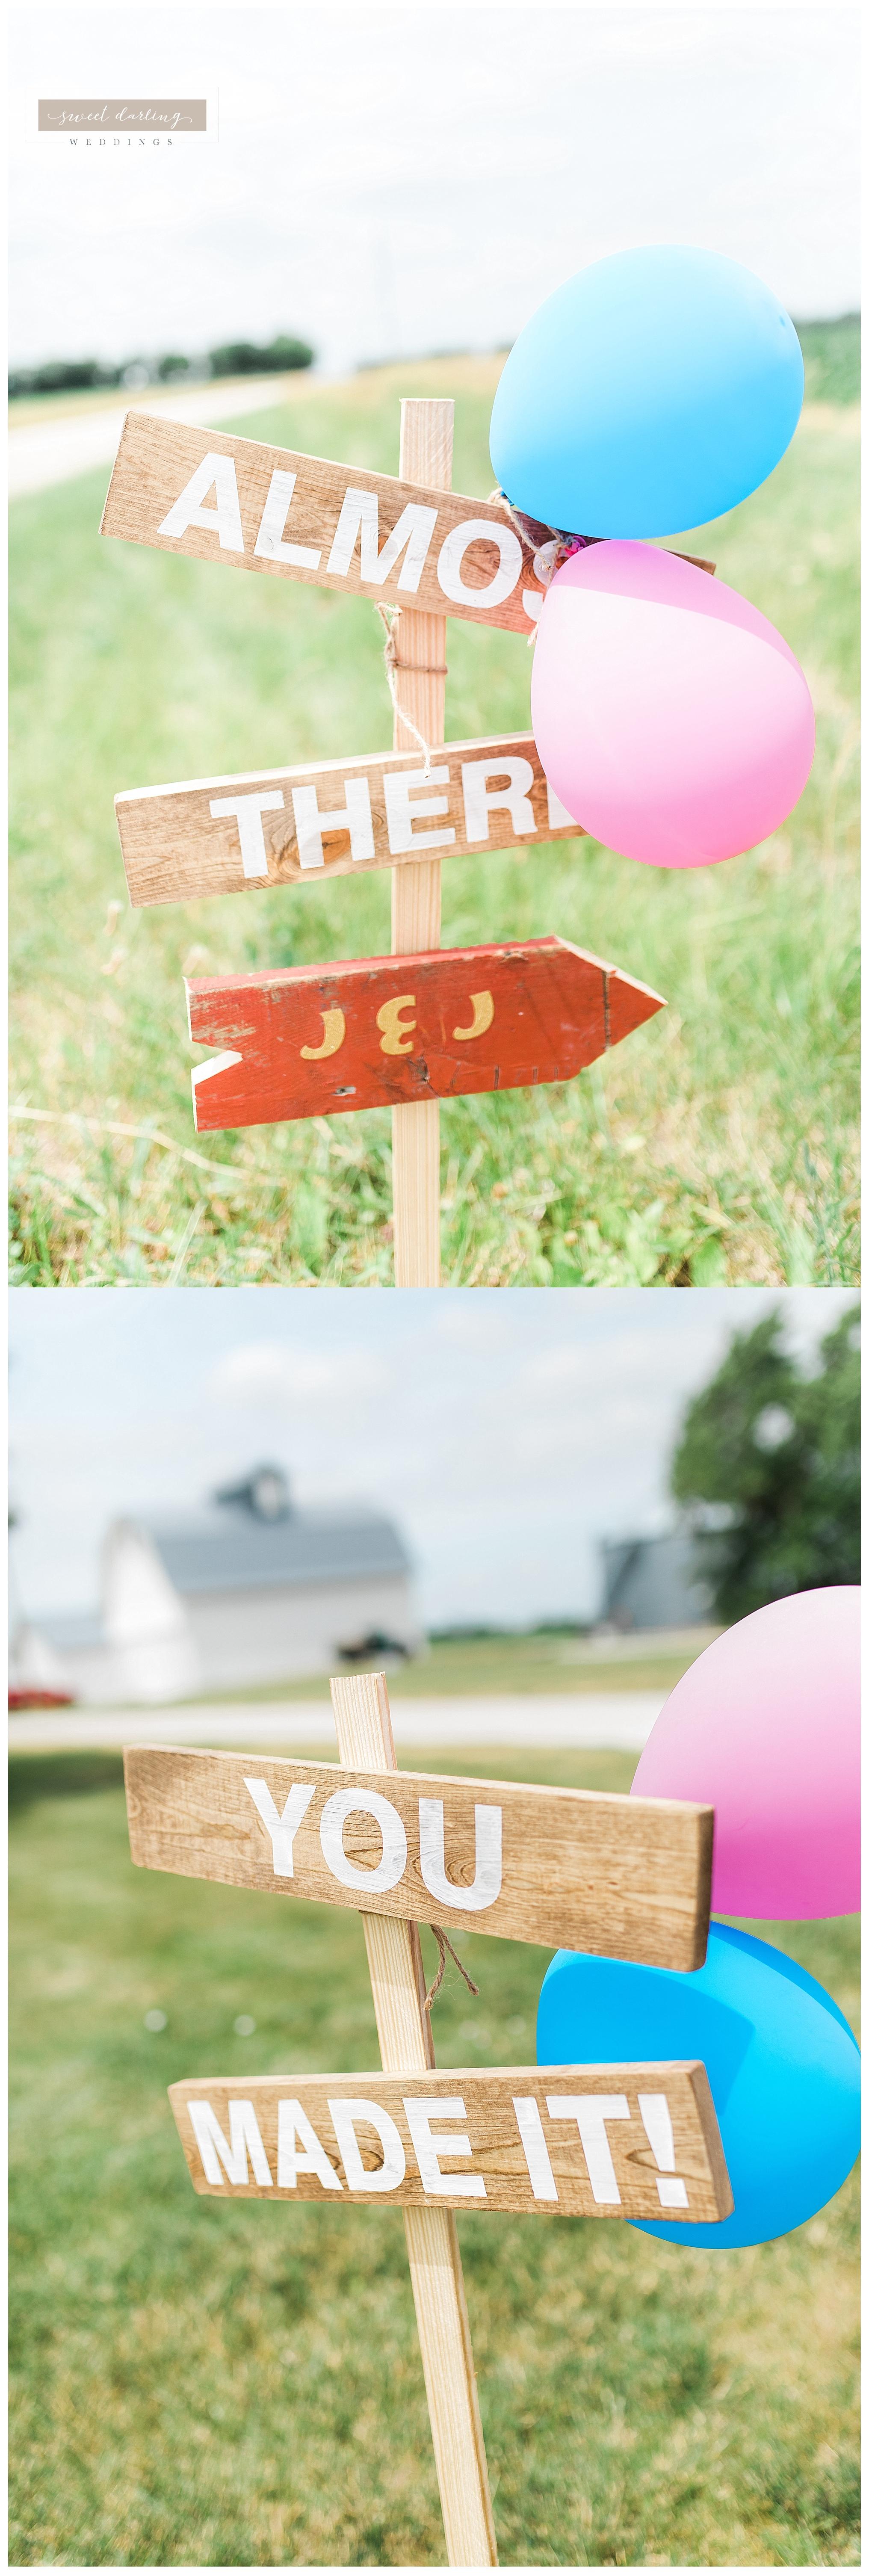 Rpaxton-illinois-engelbrecht-farm-country-wedding-photographer-sweet-darling-weddings_1274.jpg